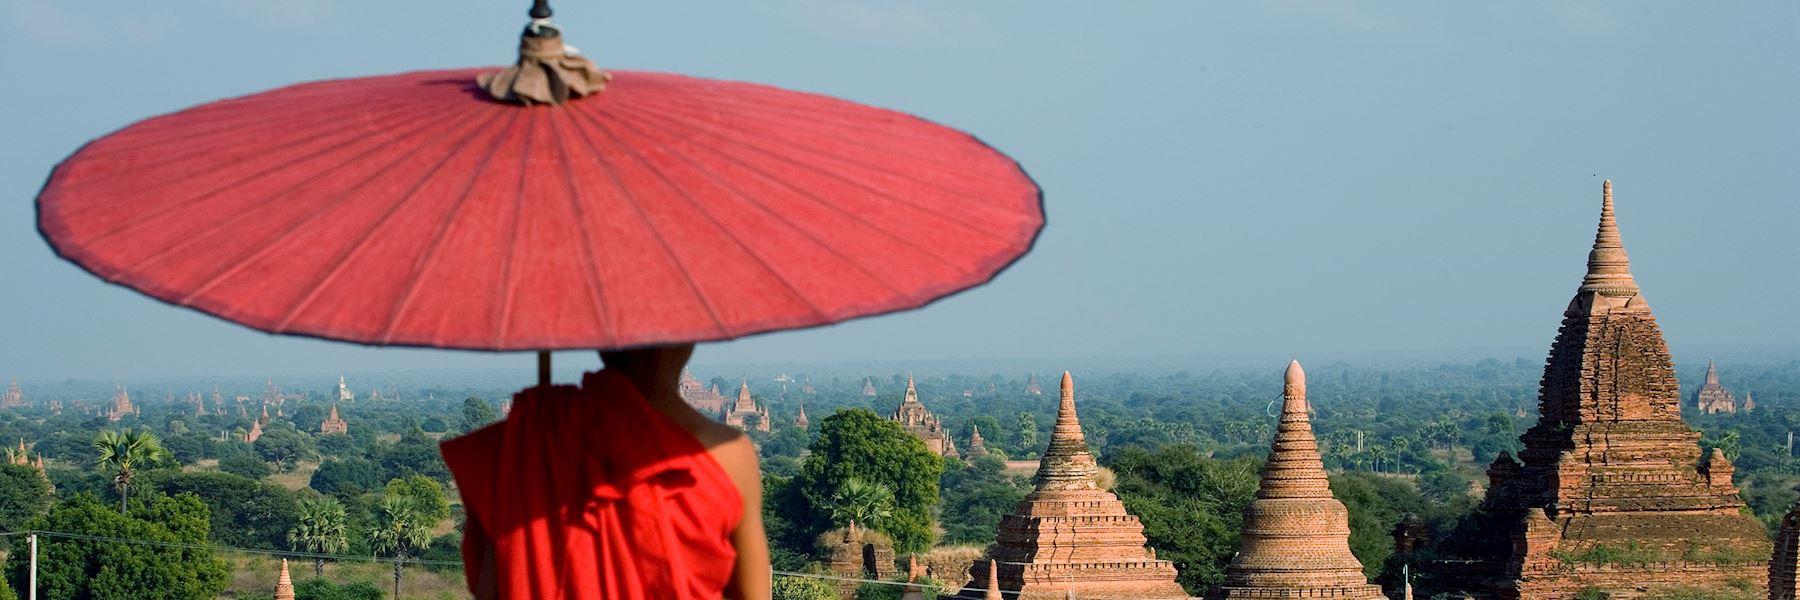 Myanmar (Burma) holidays  2019 & 2020